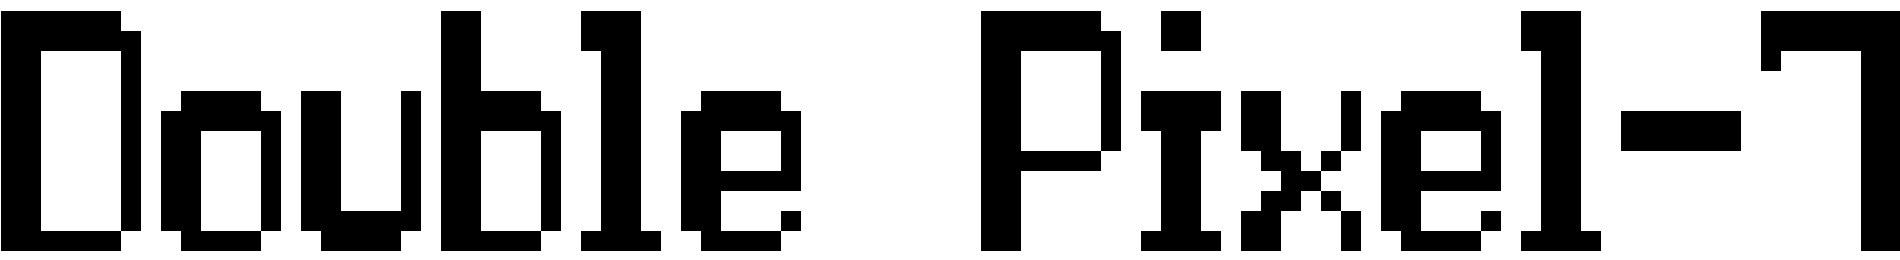 Double Pixel-7